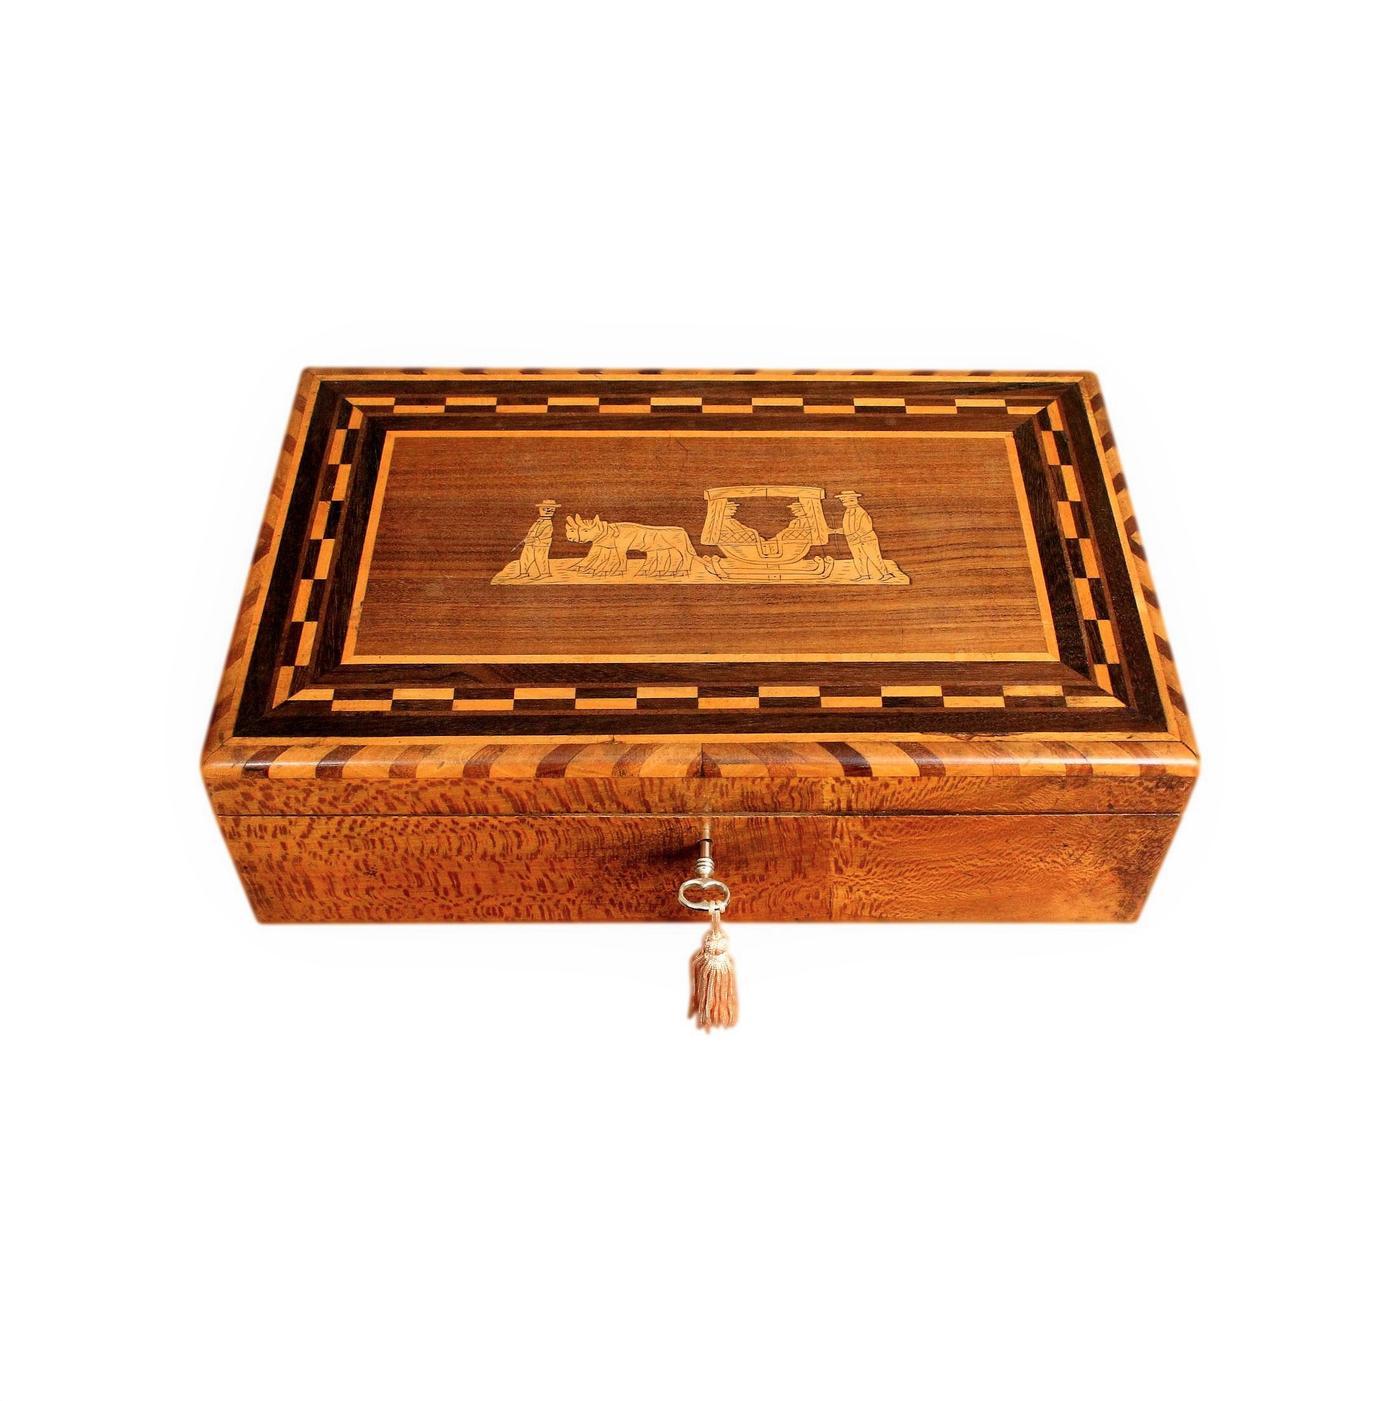 Rare Madeiran Marquetry Inlaid Vintage Snakewood Jewellery Box